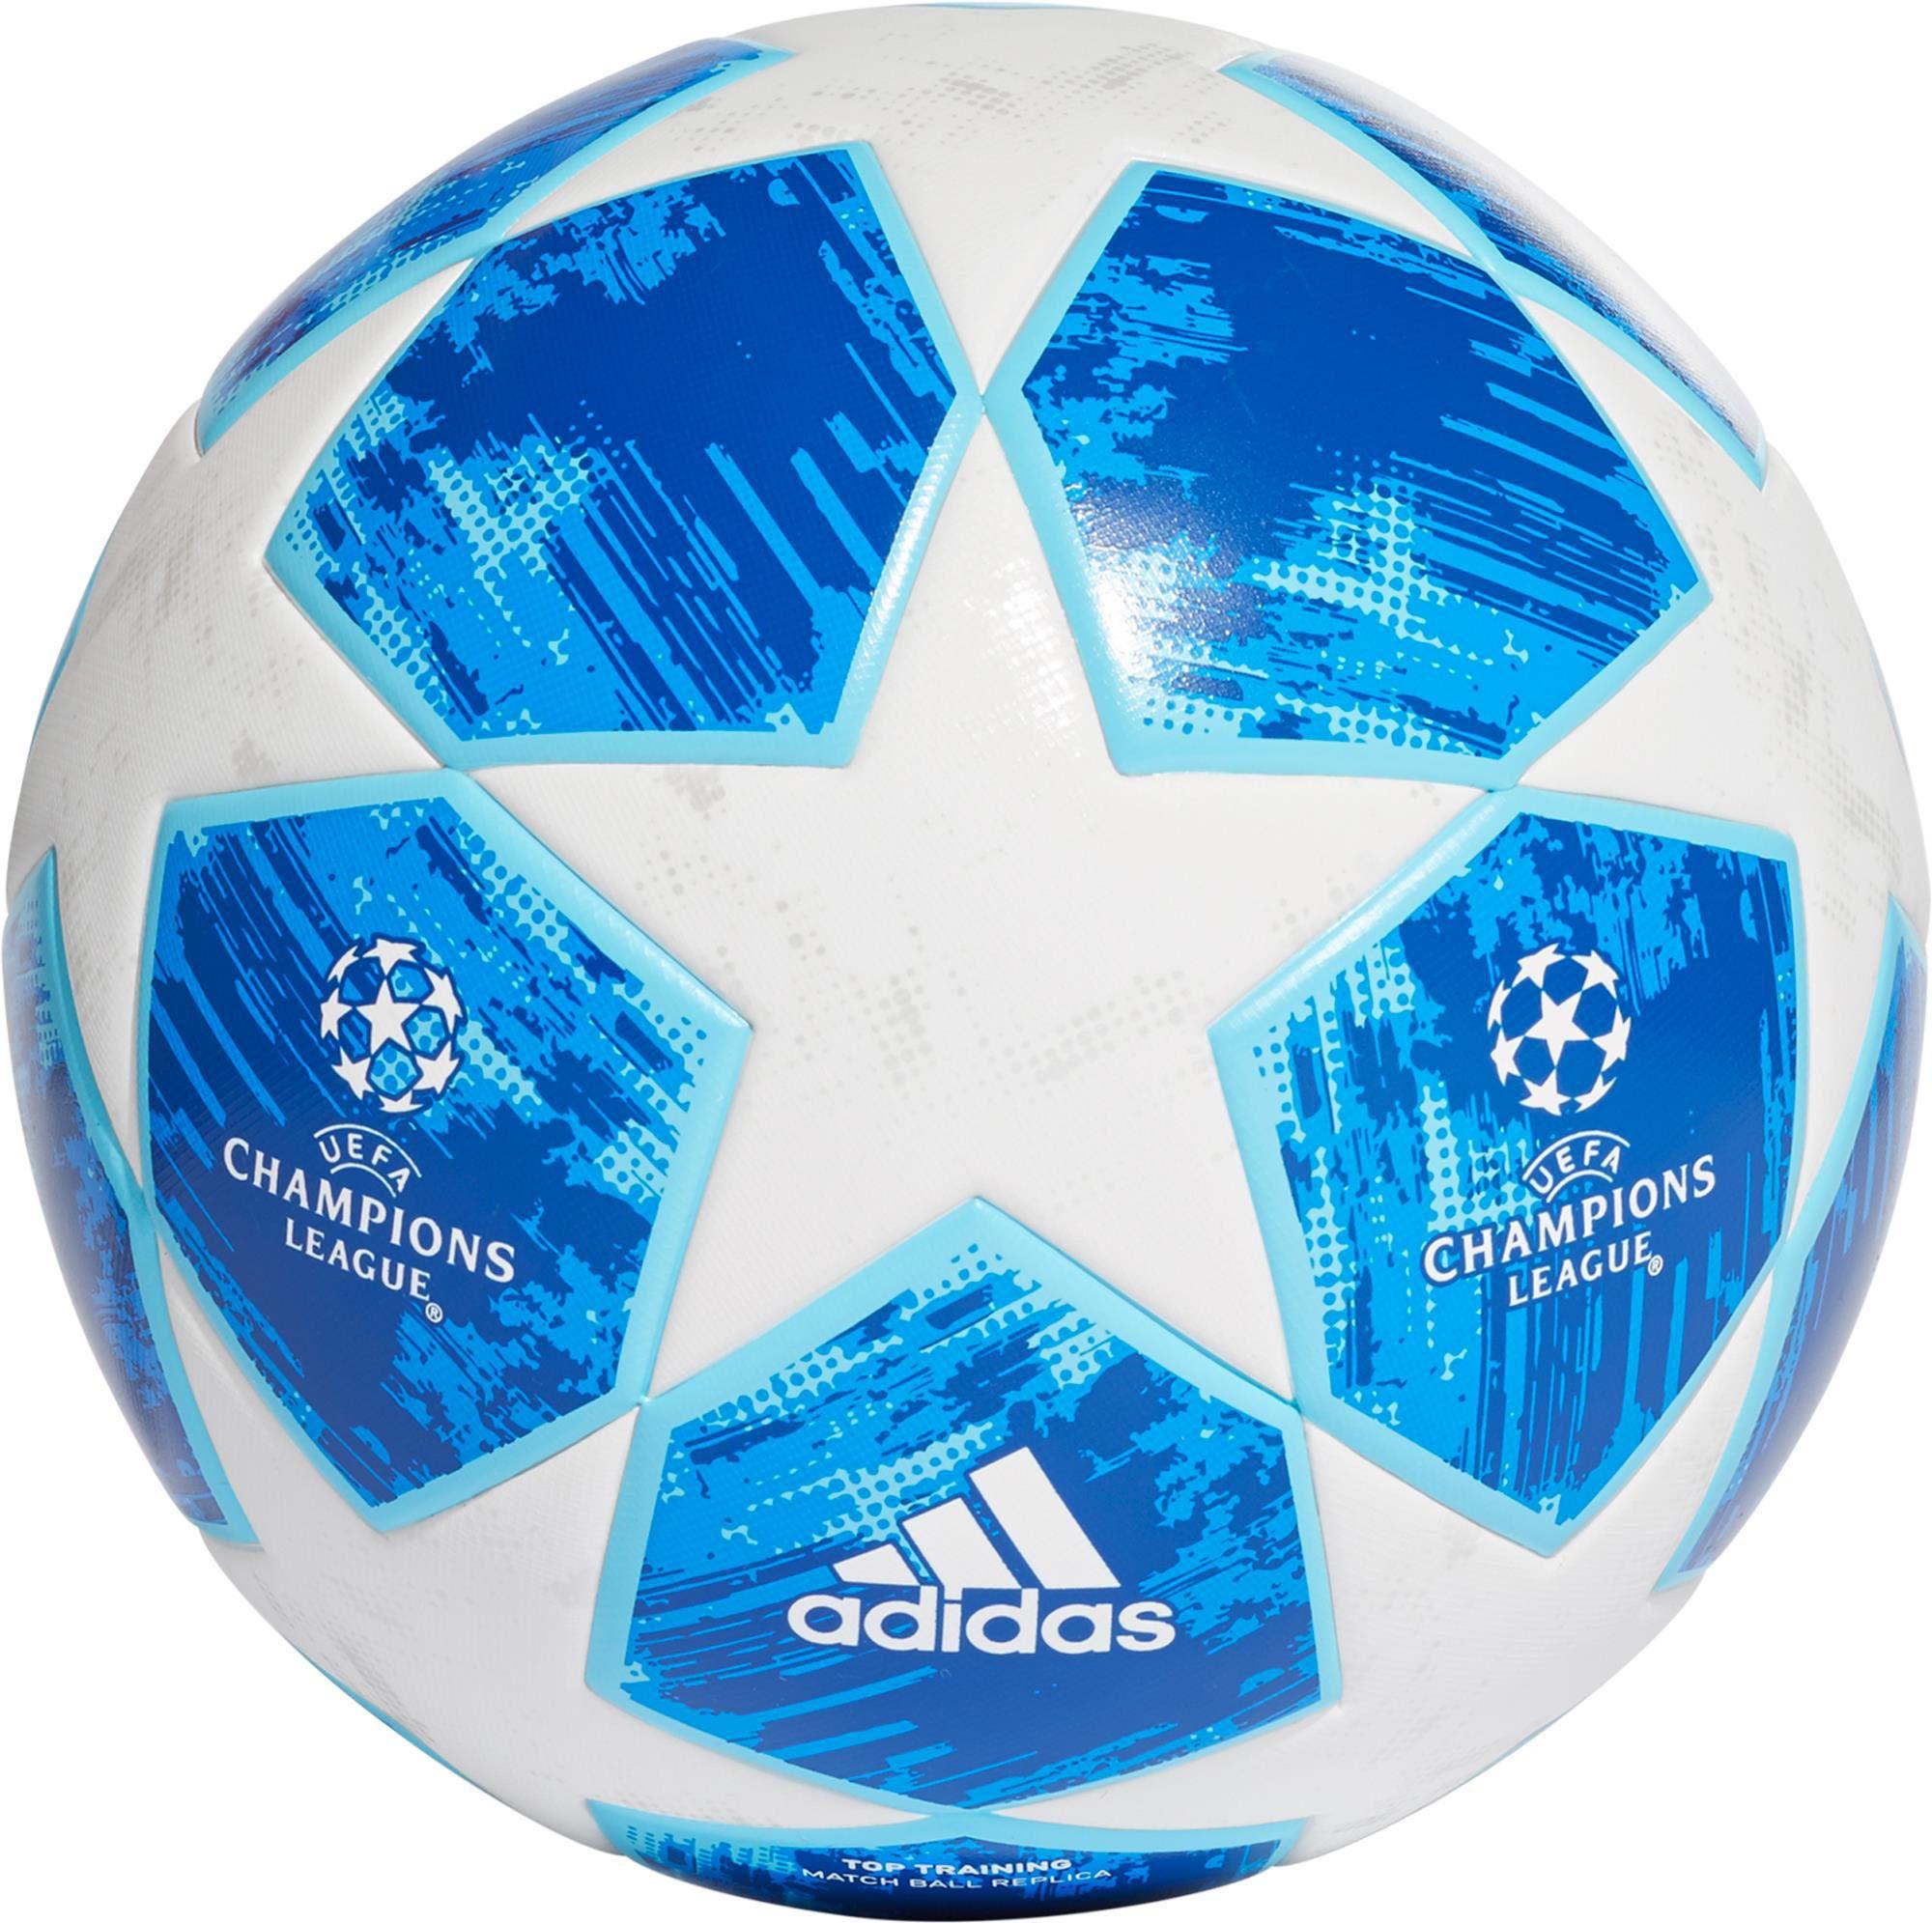 6b1a6ffb8374 adidas UEFA Champions League Finale Top Training Soccer Ball ...